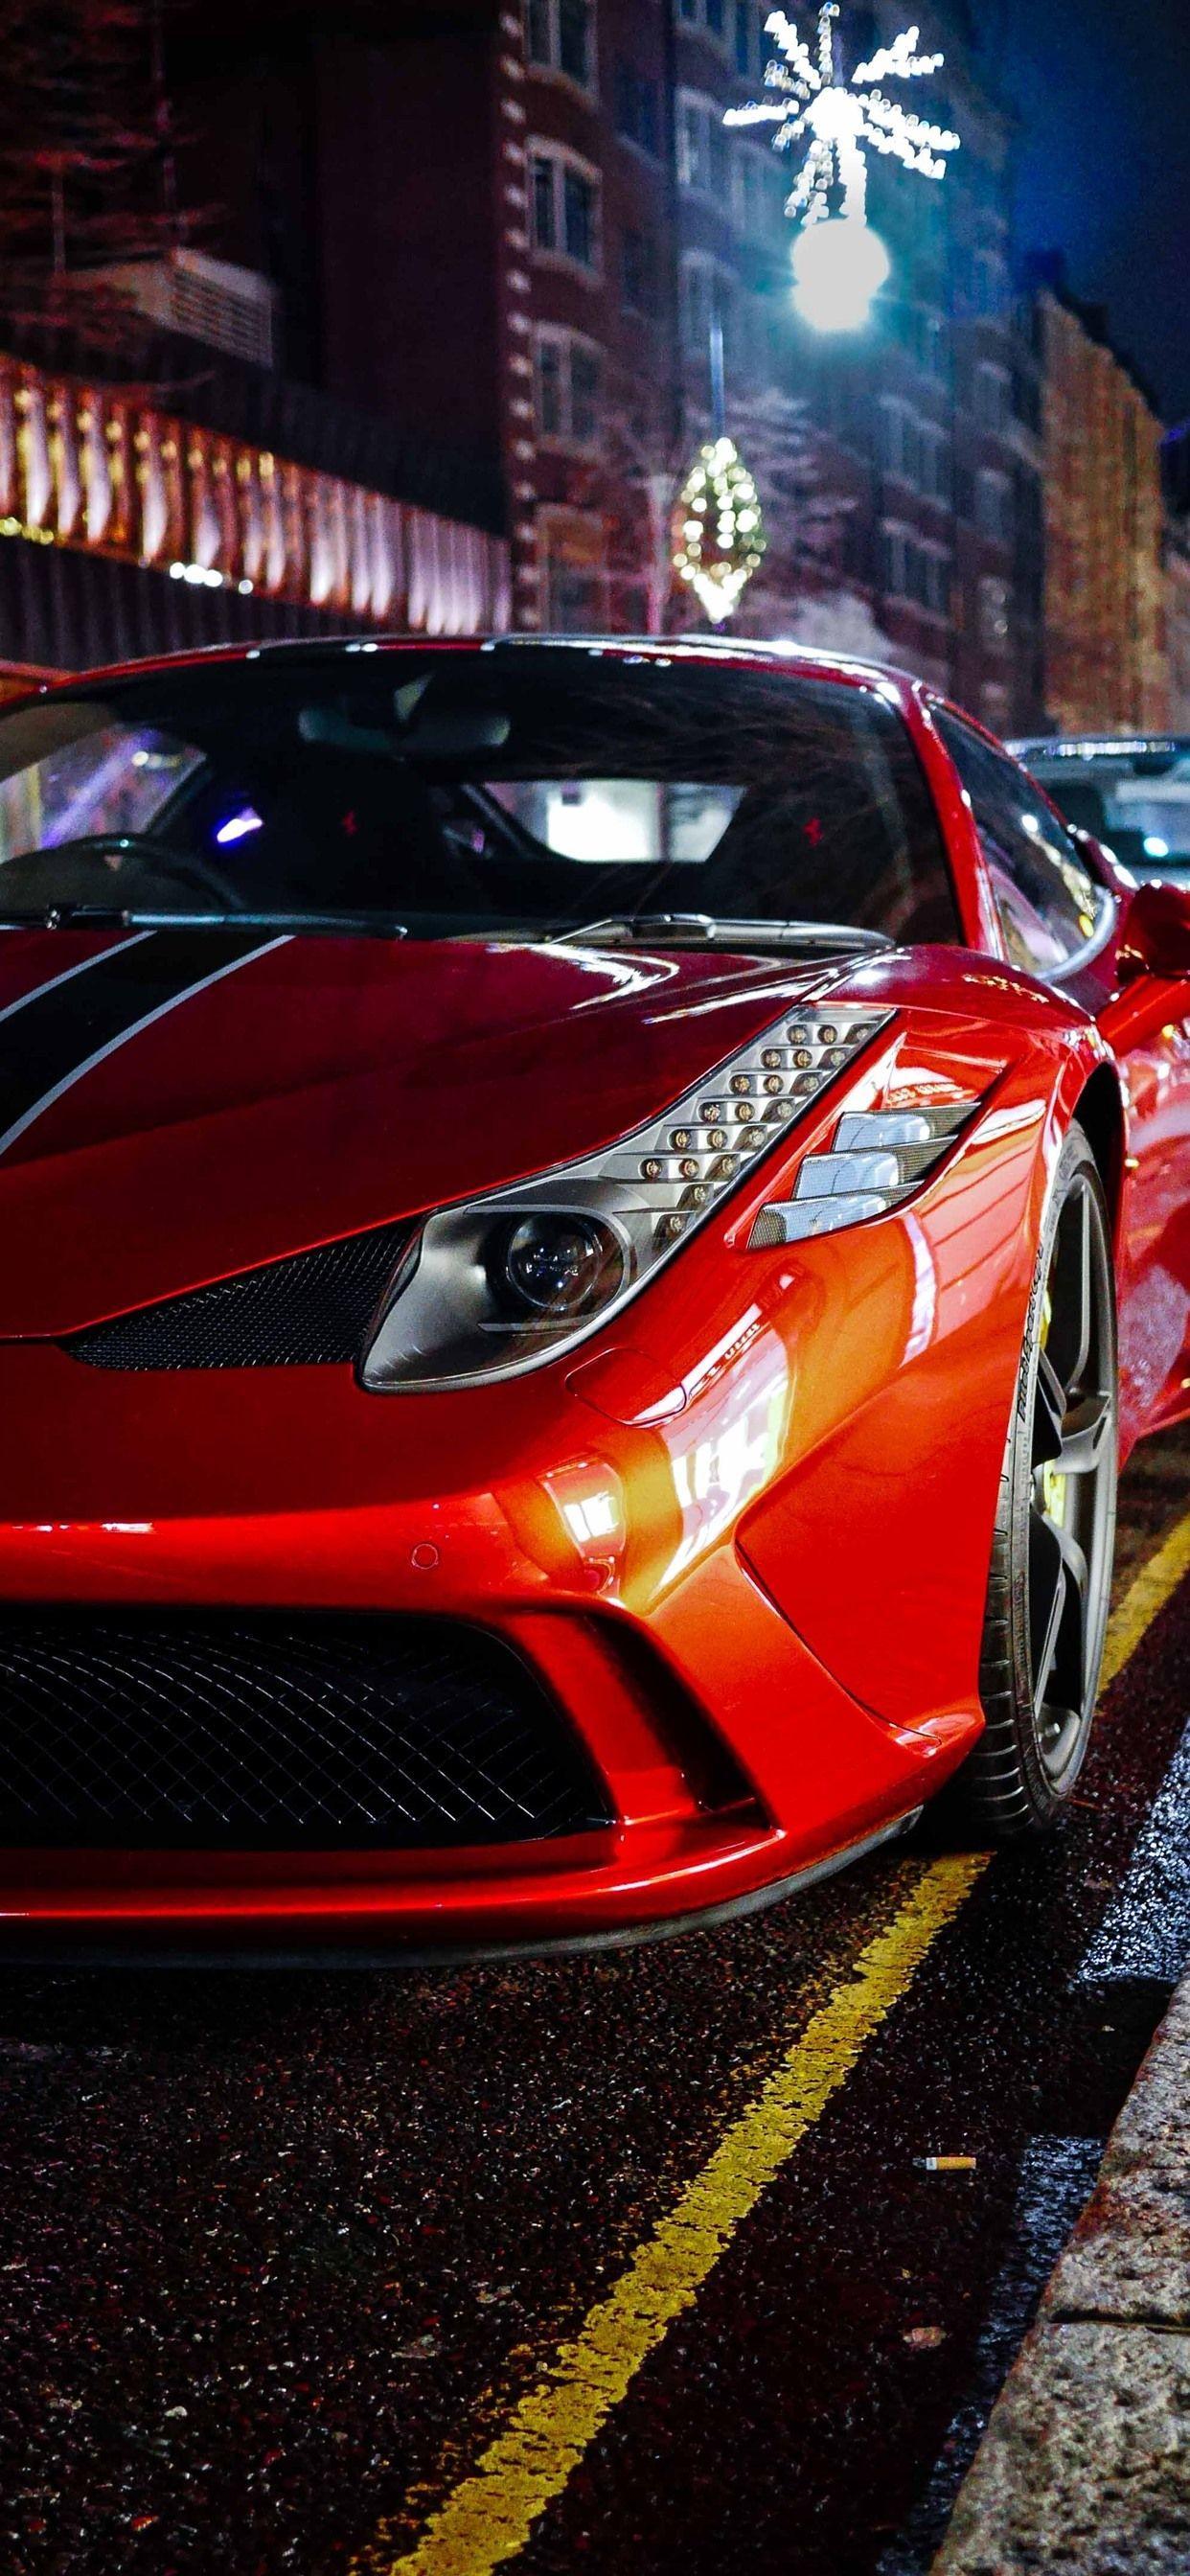 Ferrari Iphone Wallpapers Top Free Ferrari Iphone Backgrounds Wallpaperaccess